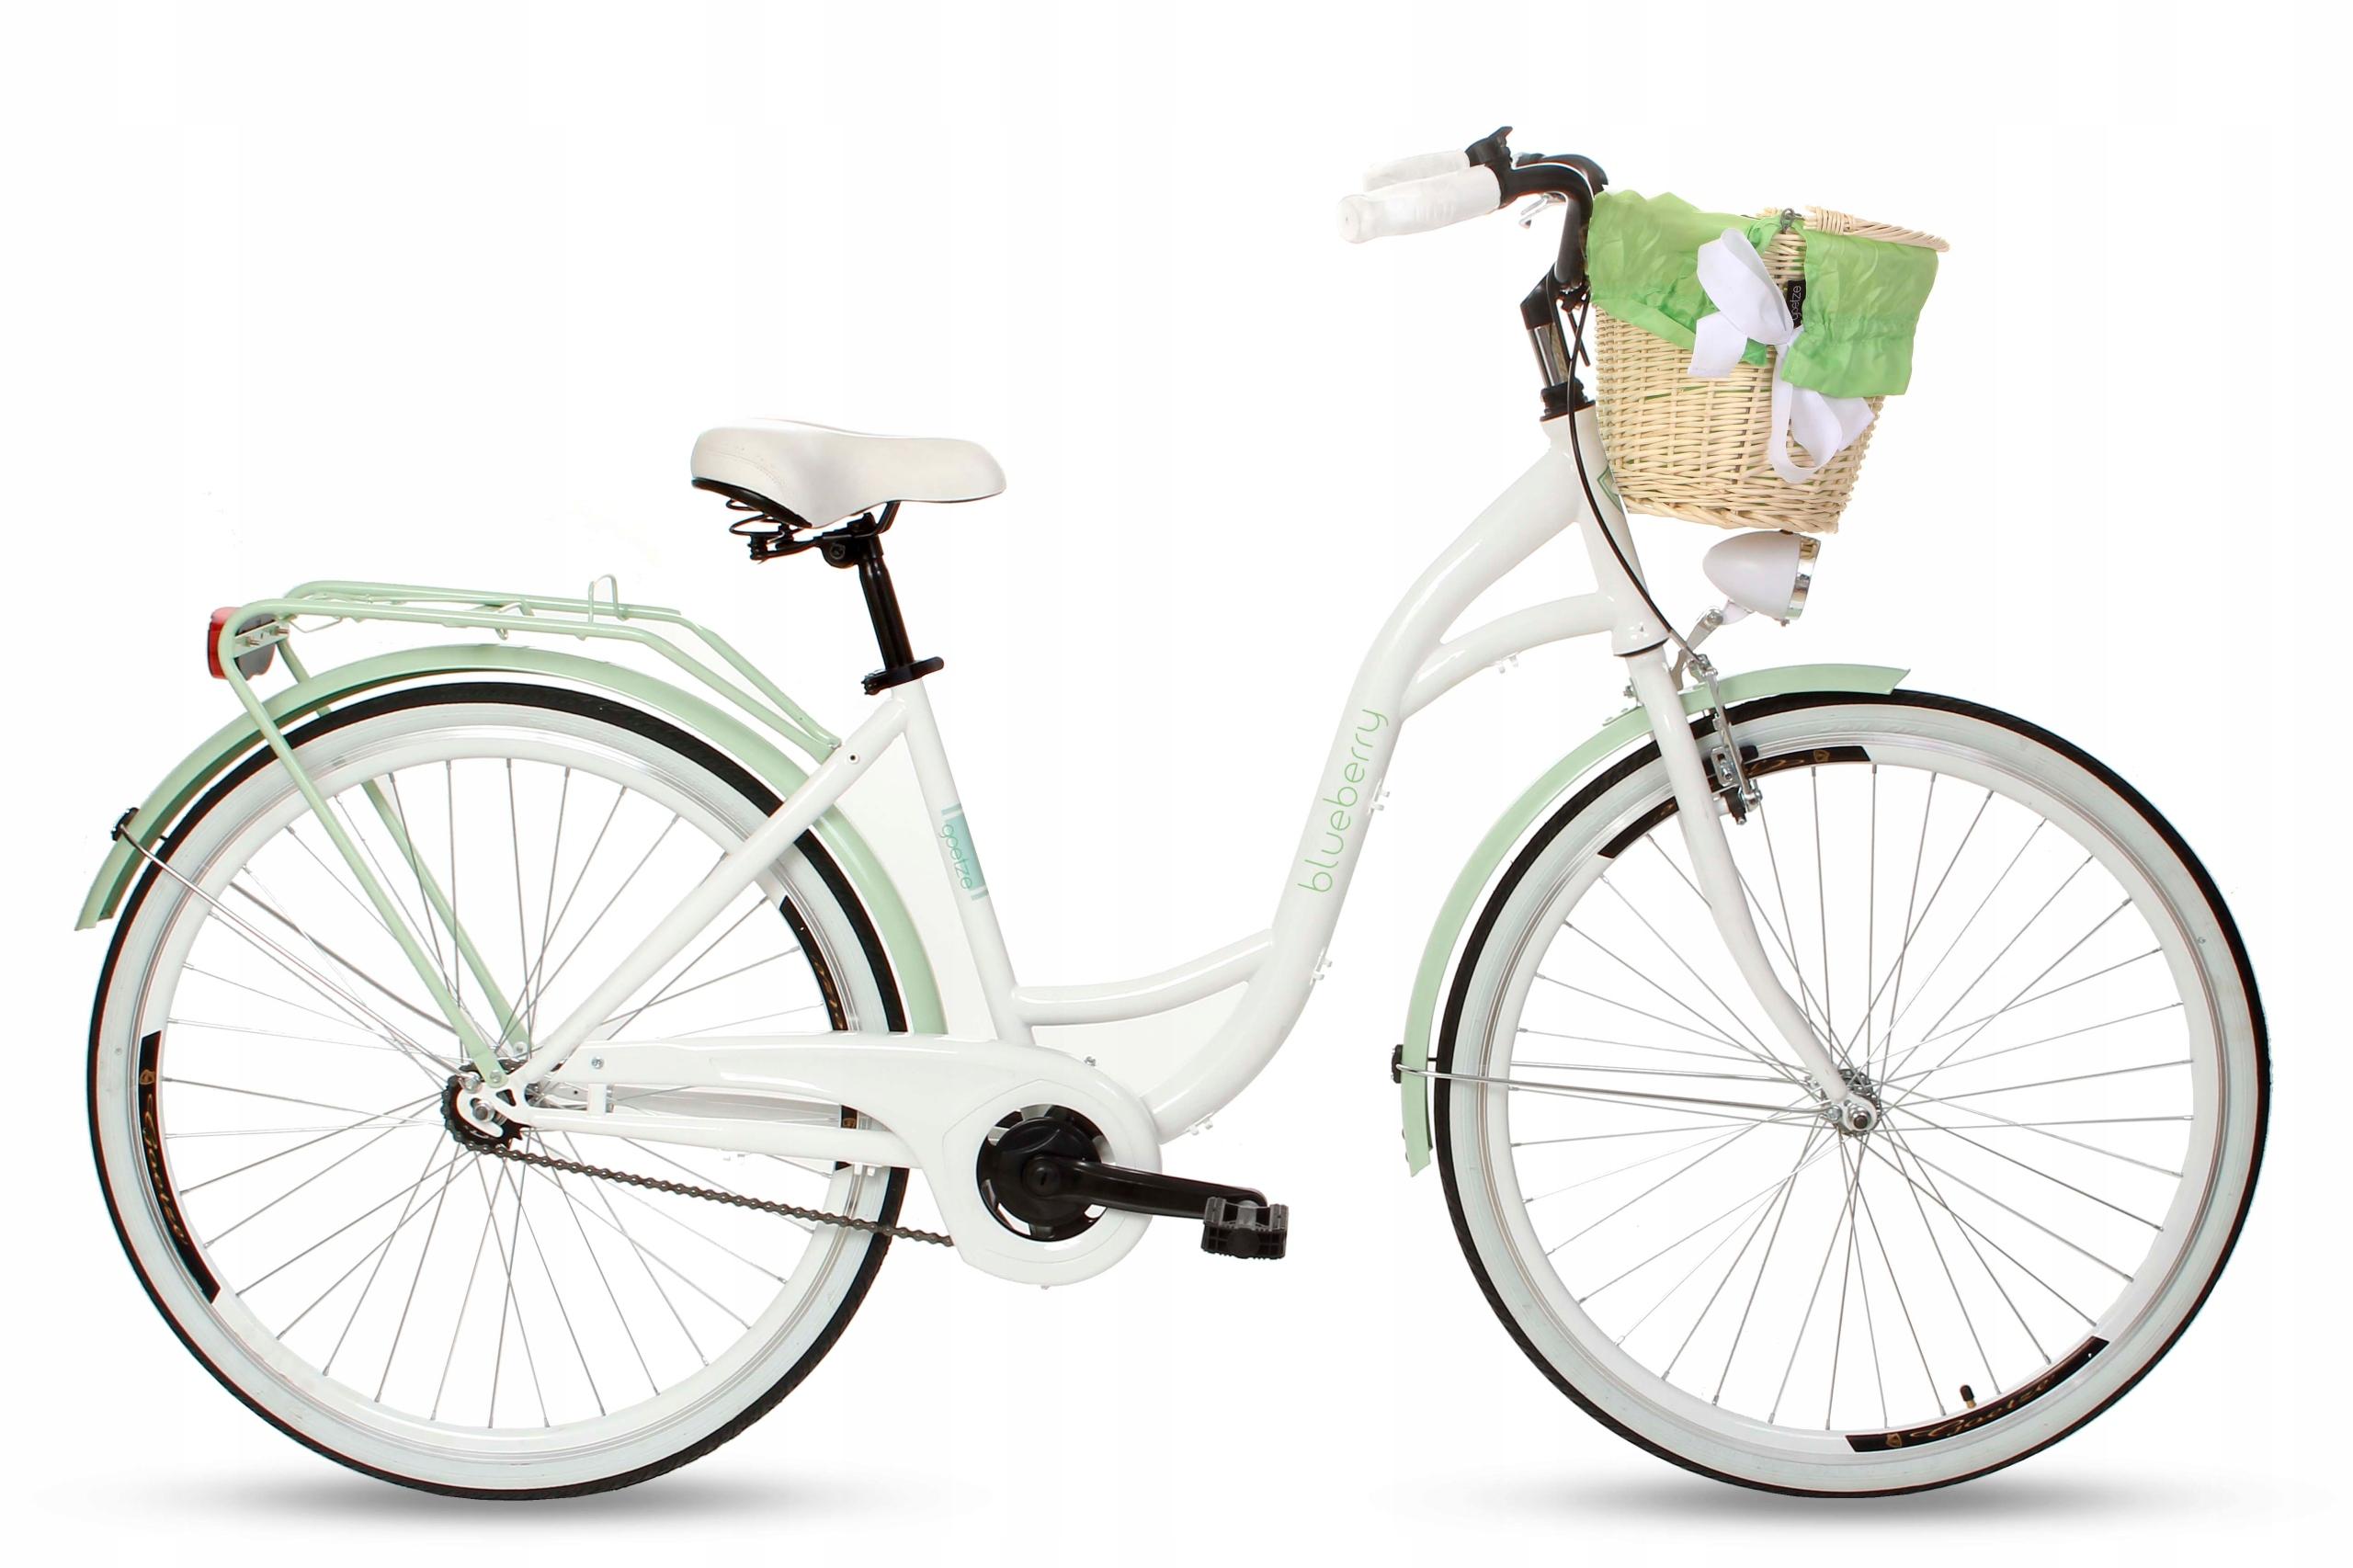 Dámsky mestský bicykel Goetze BLUEBERRY 28 košík!  Veľkosť rámu 18 palcov